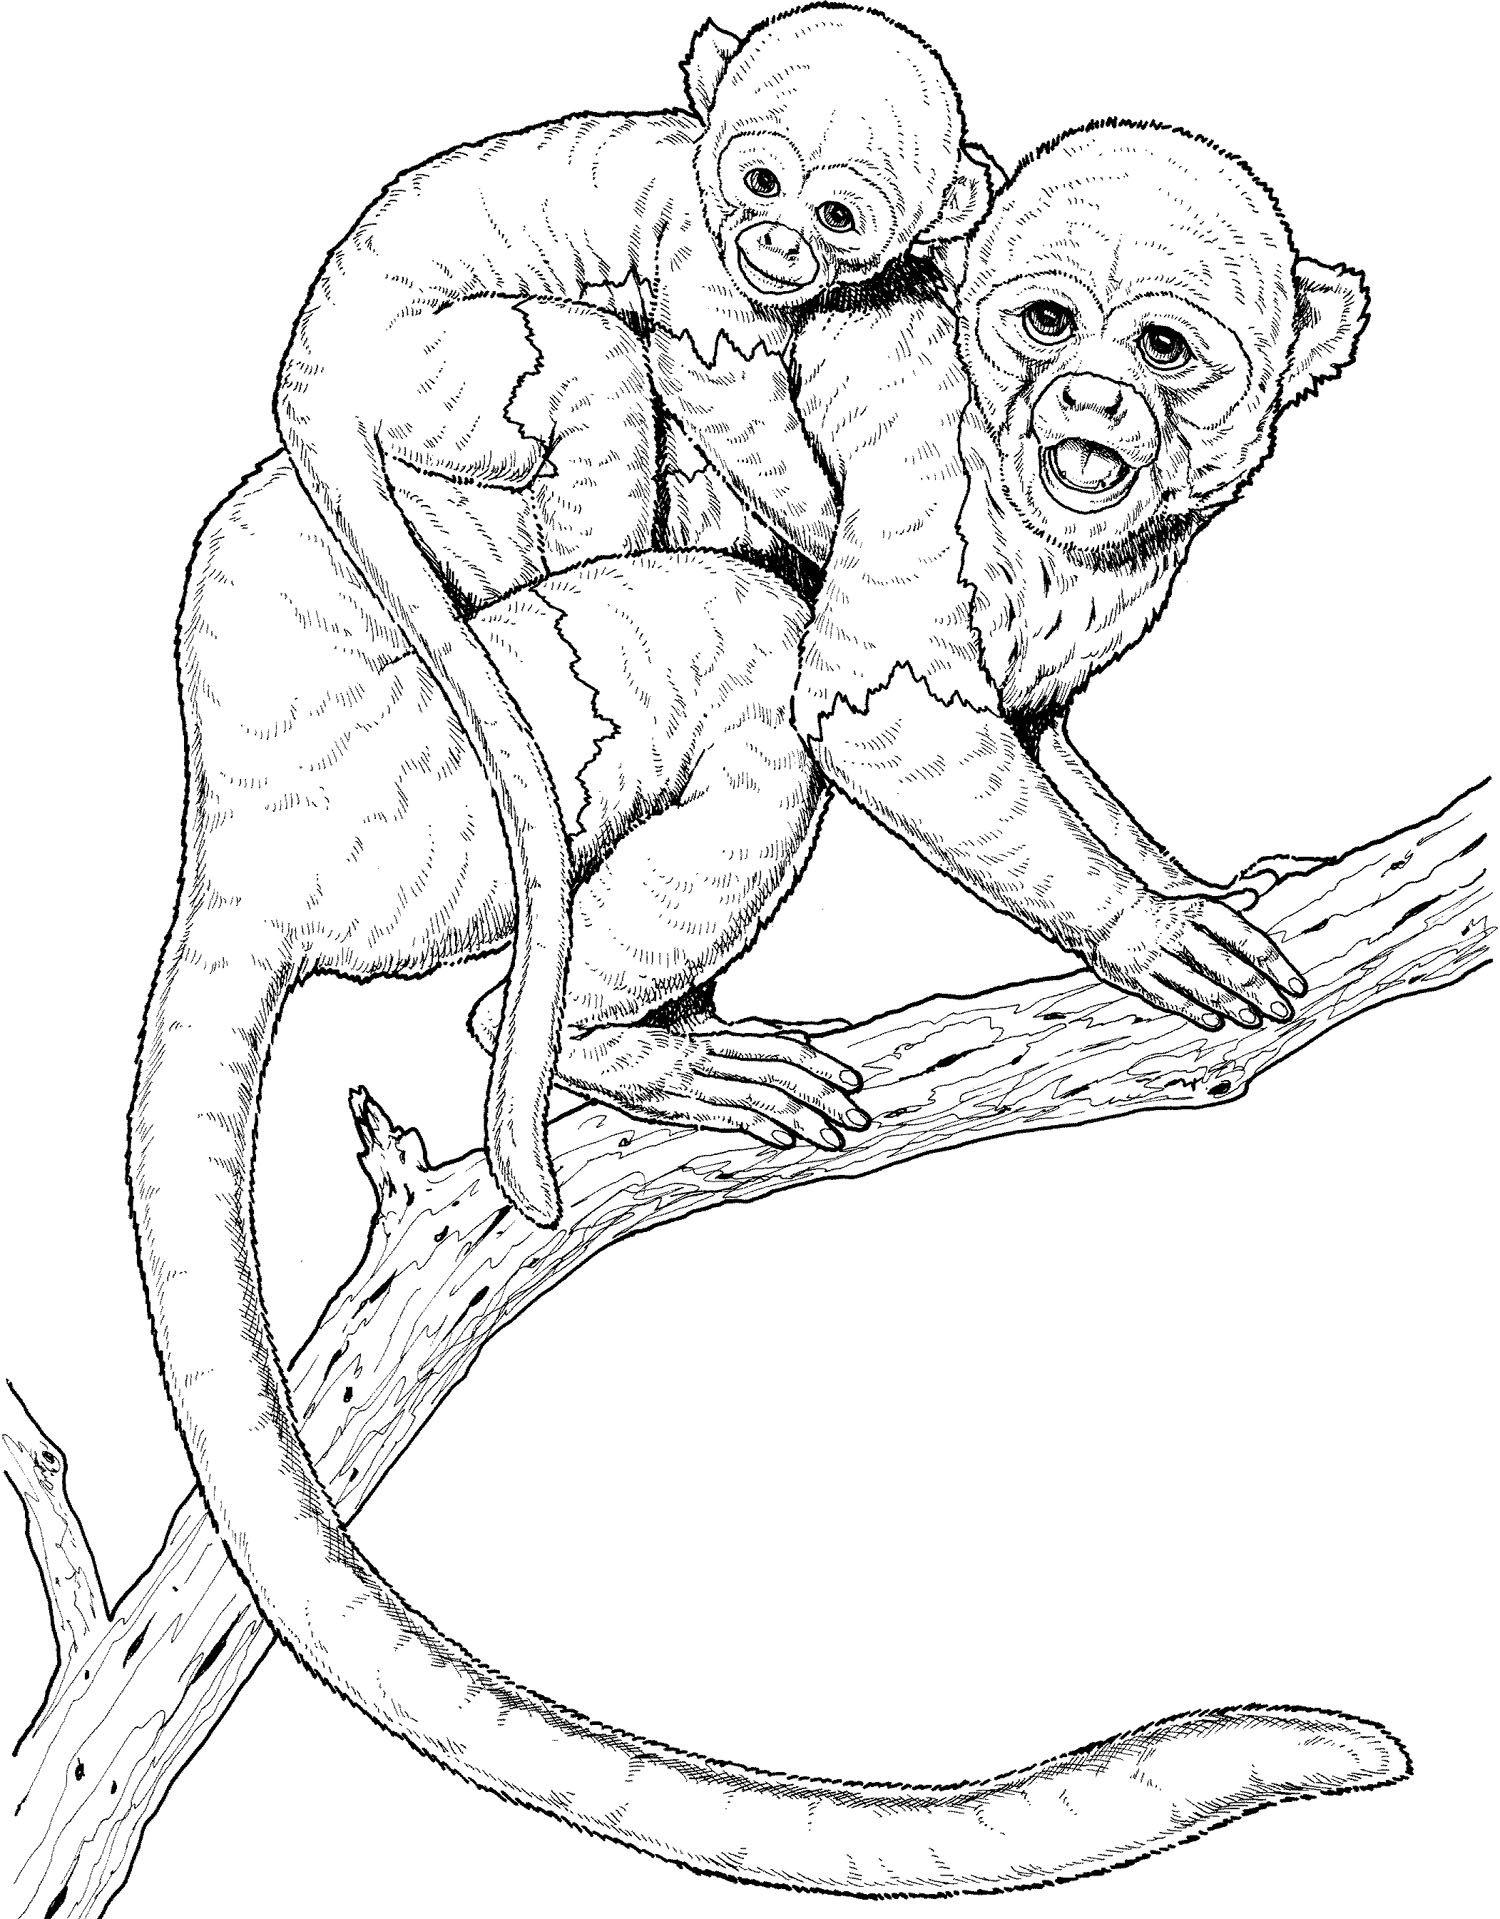 Monkey On A Branch Tree Coloring Page | Tree | Pinterest | Monkey